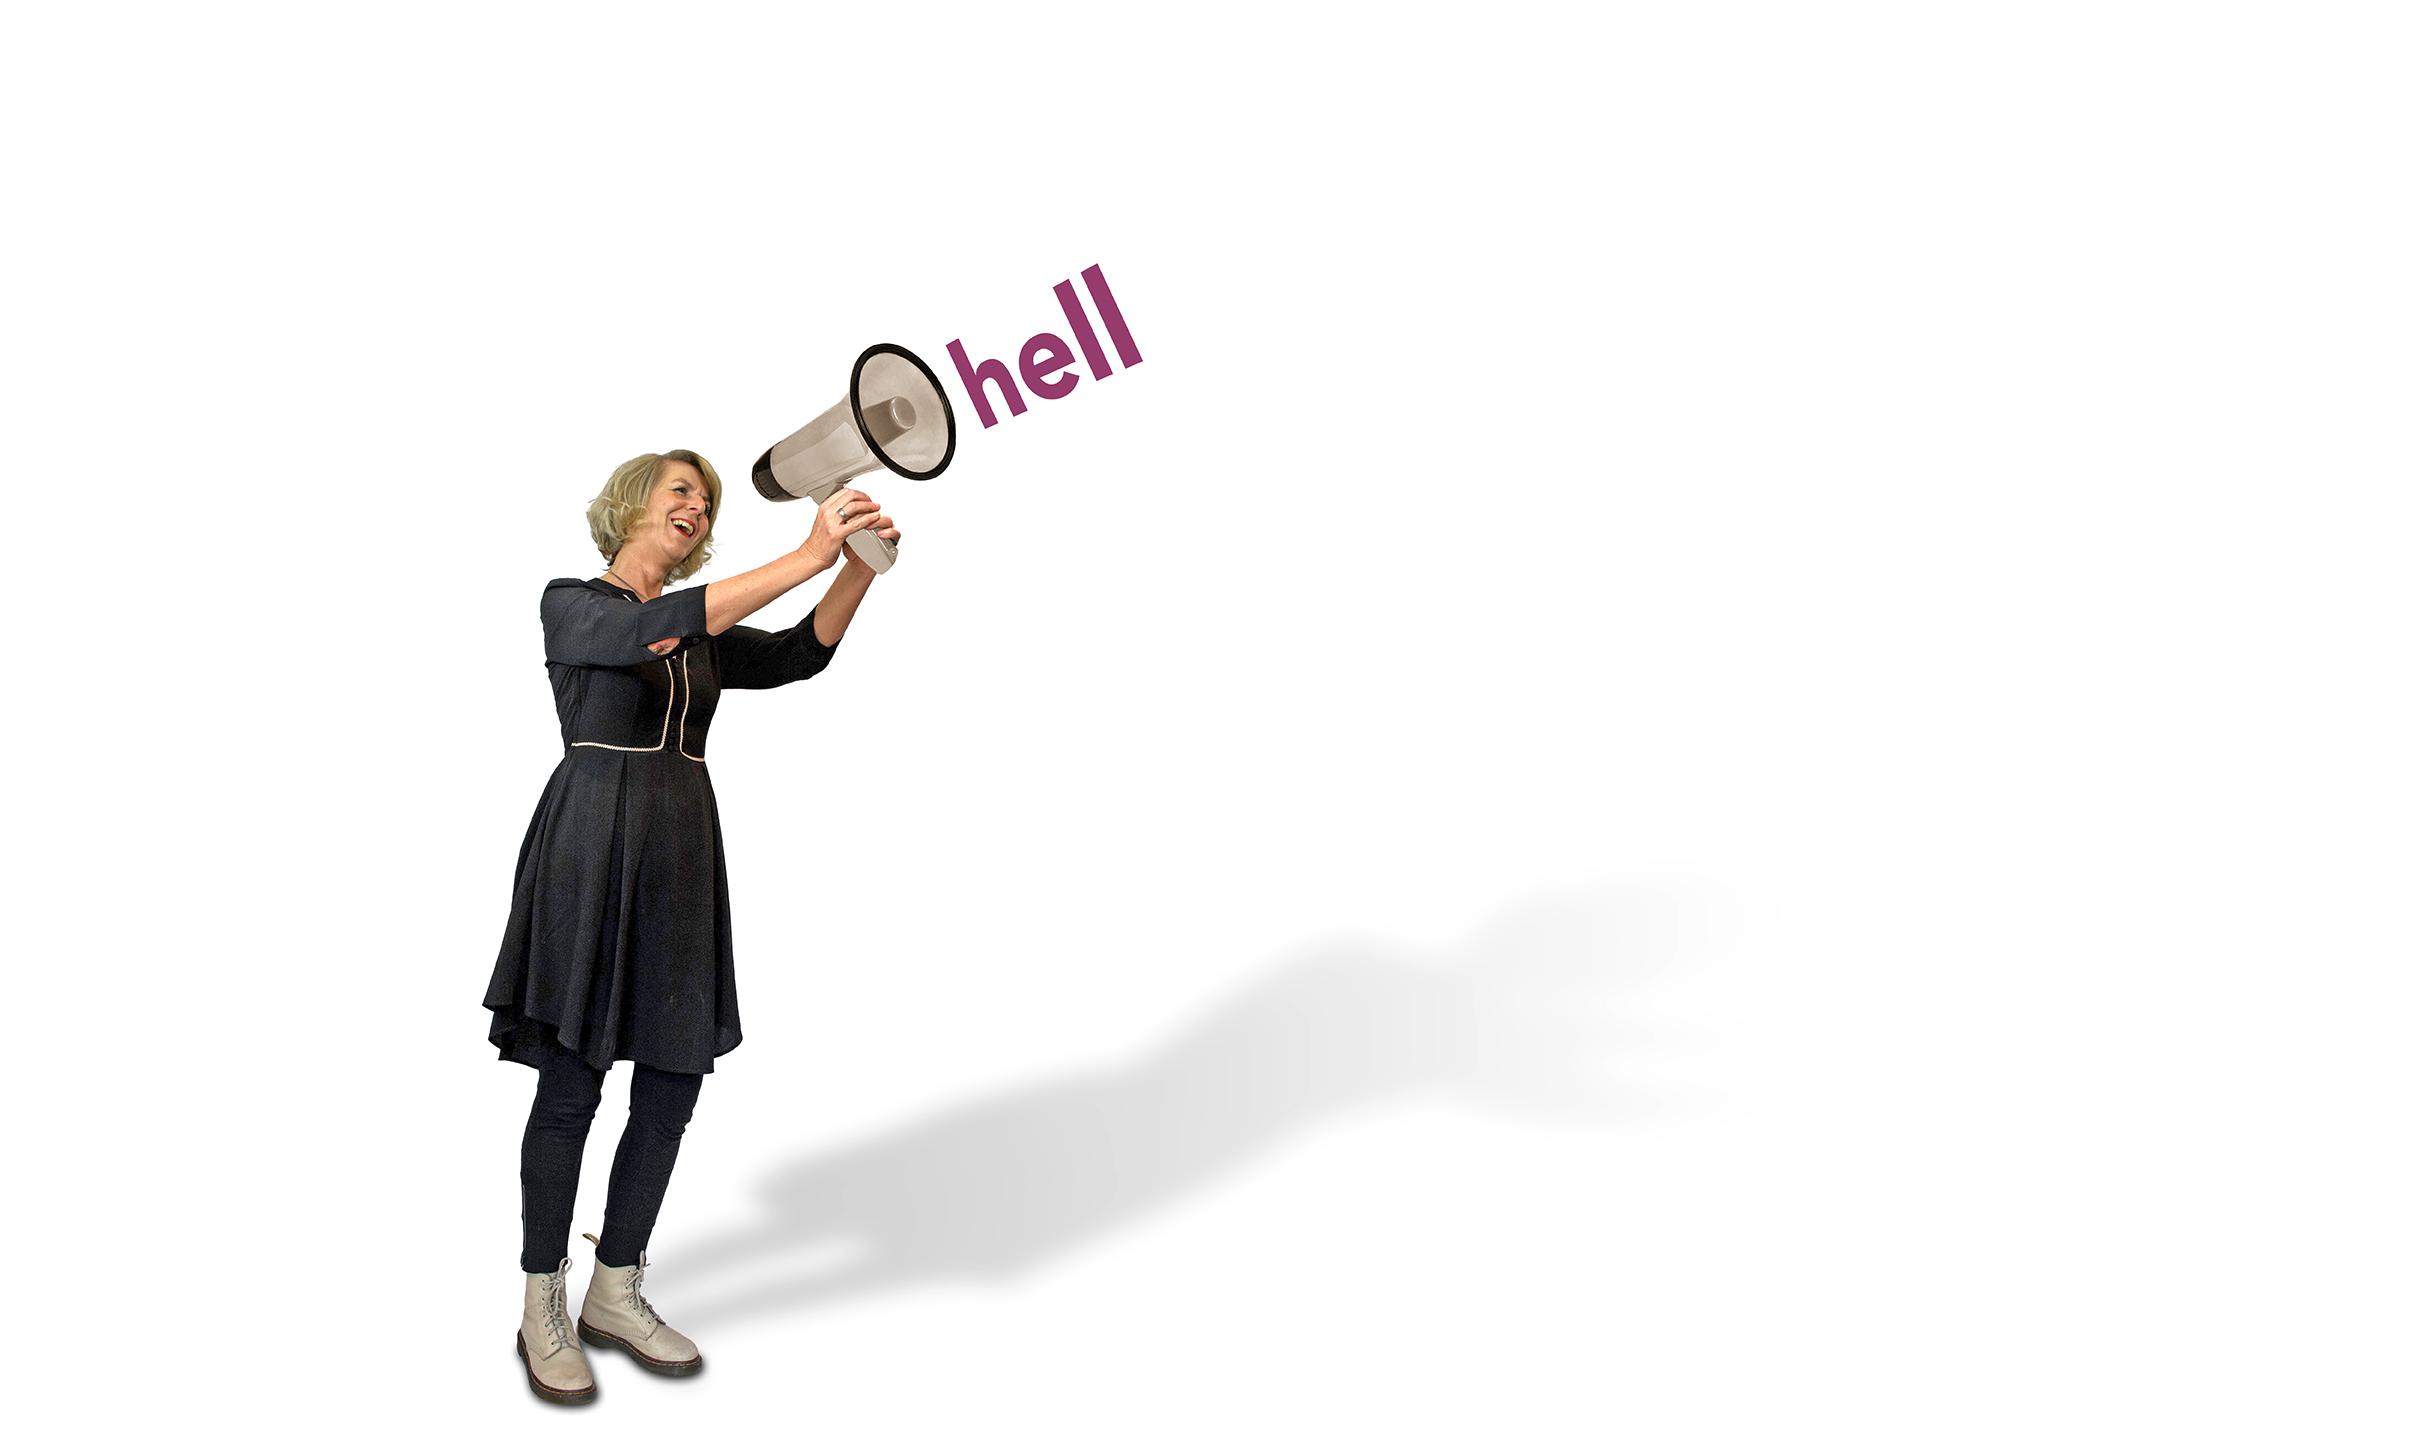 Hello_hell